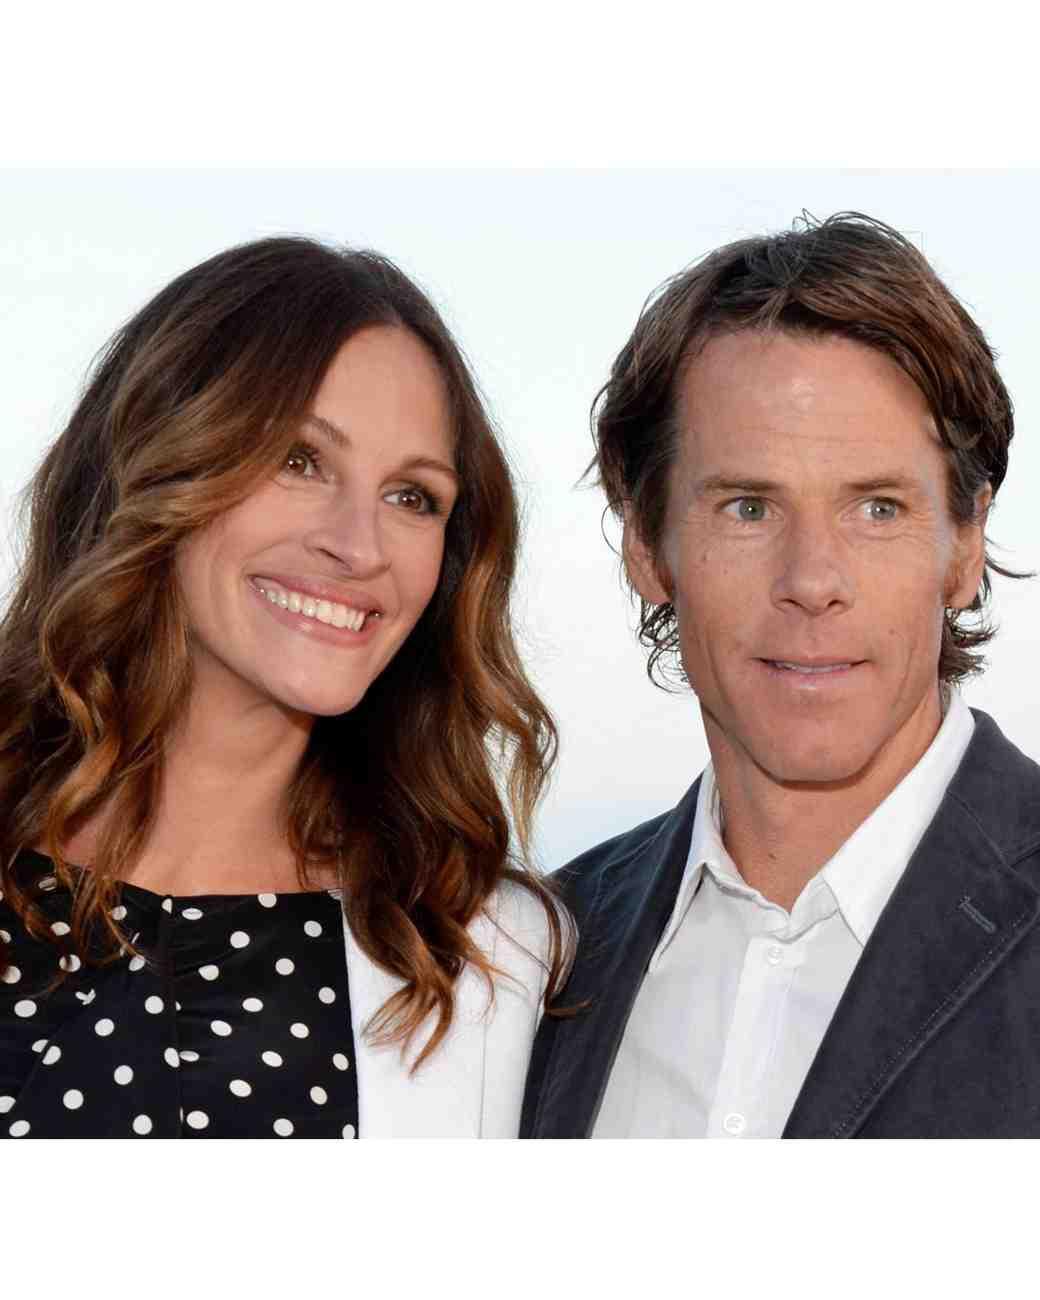 secret-celebrity-weddings-julia-roberts-danny-moder.jpg